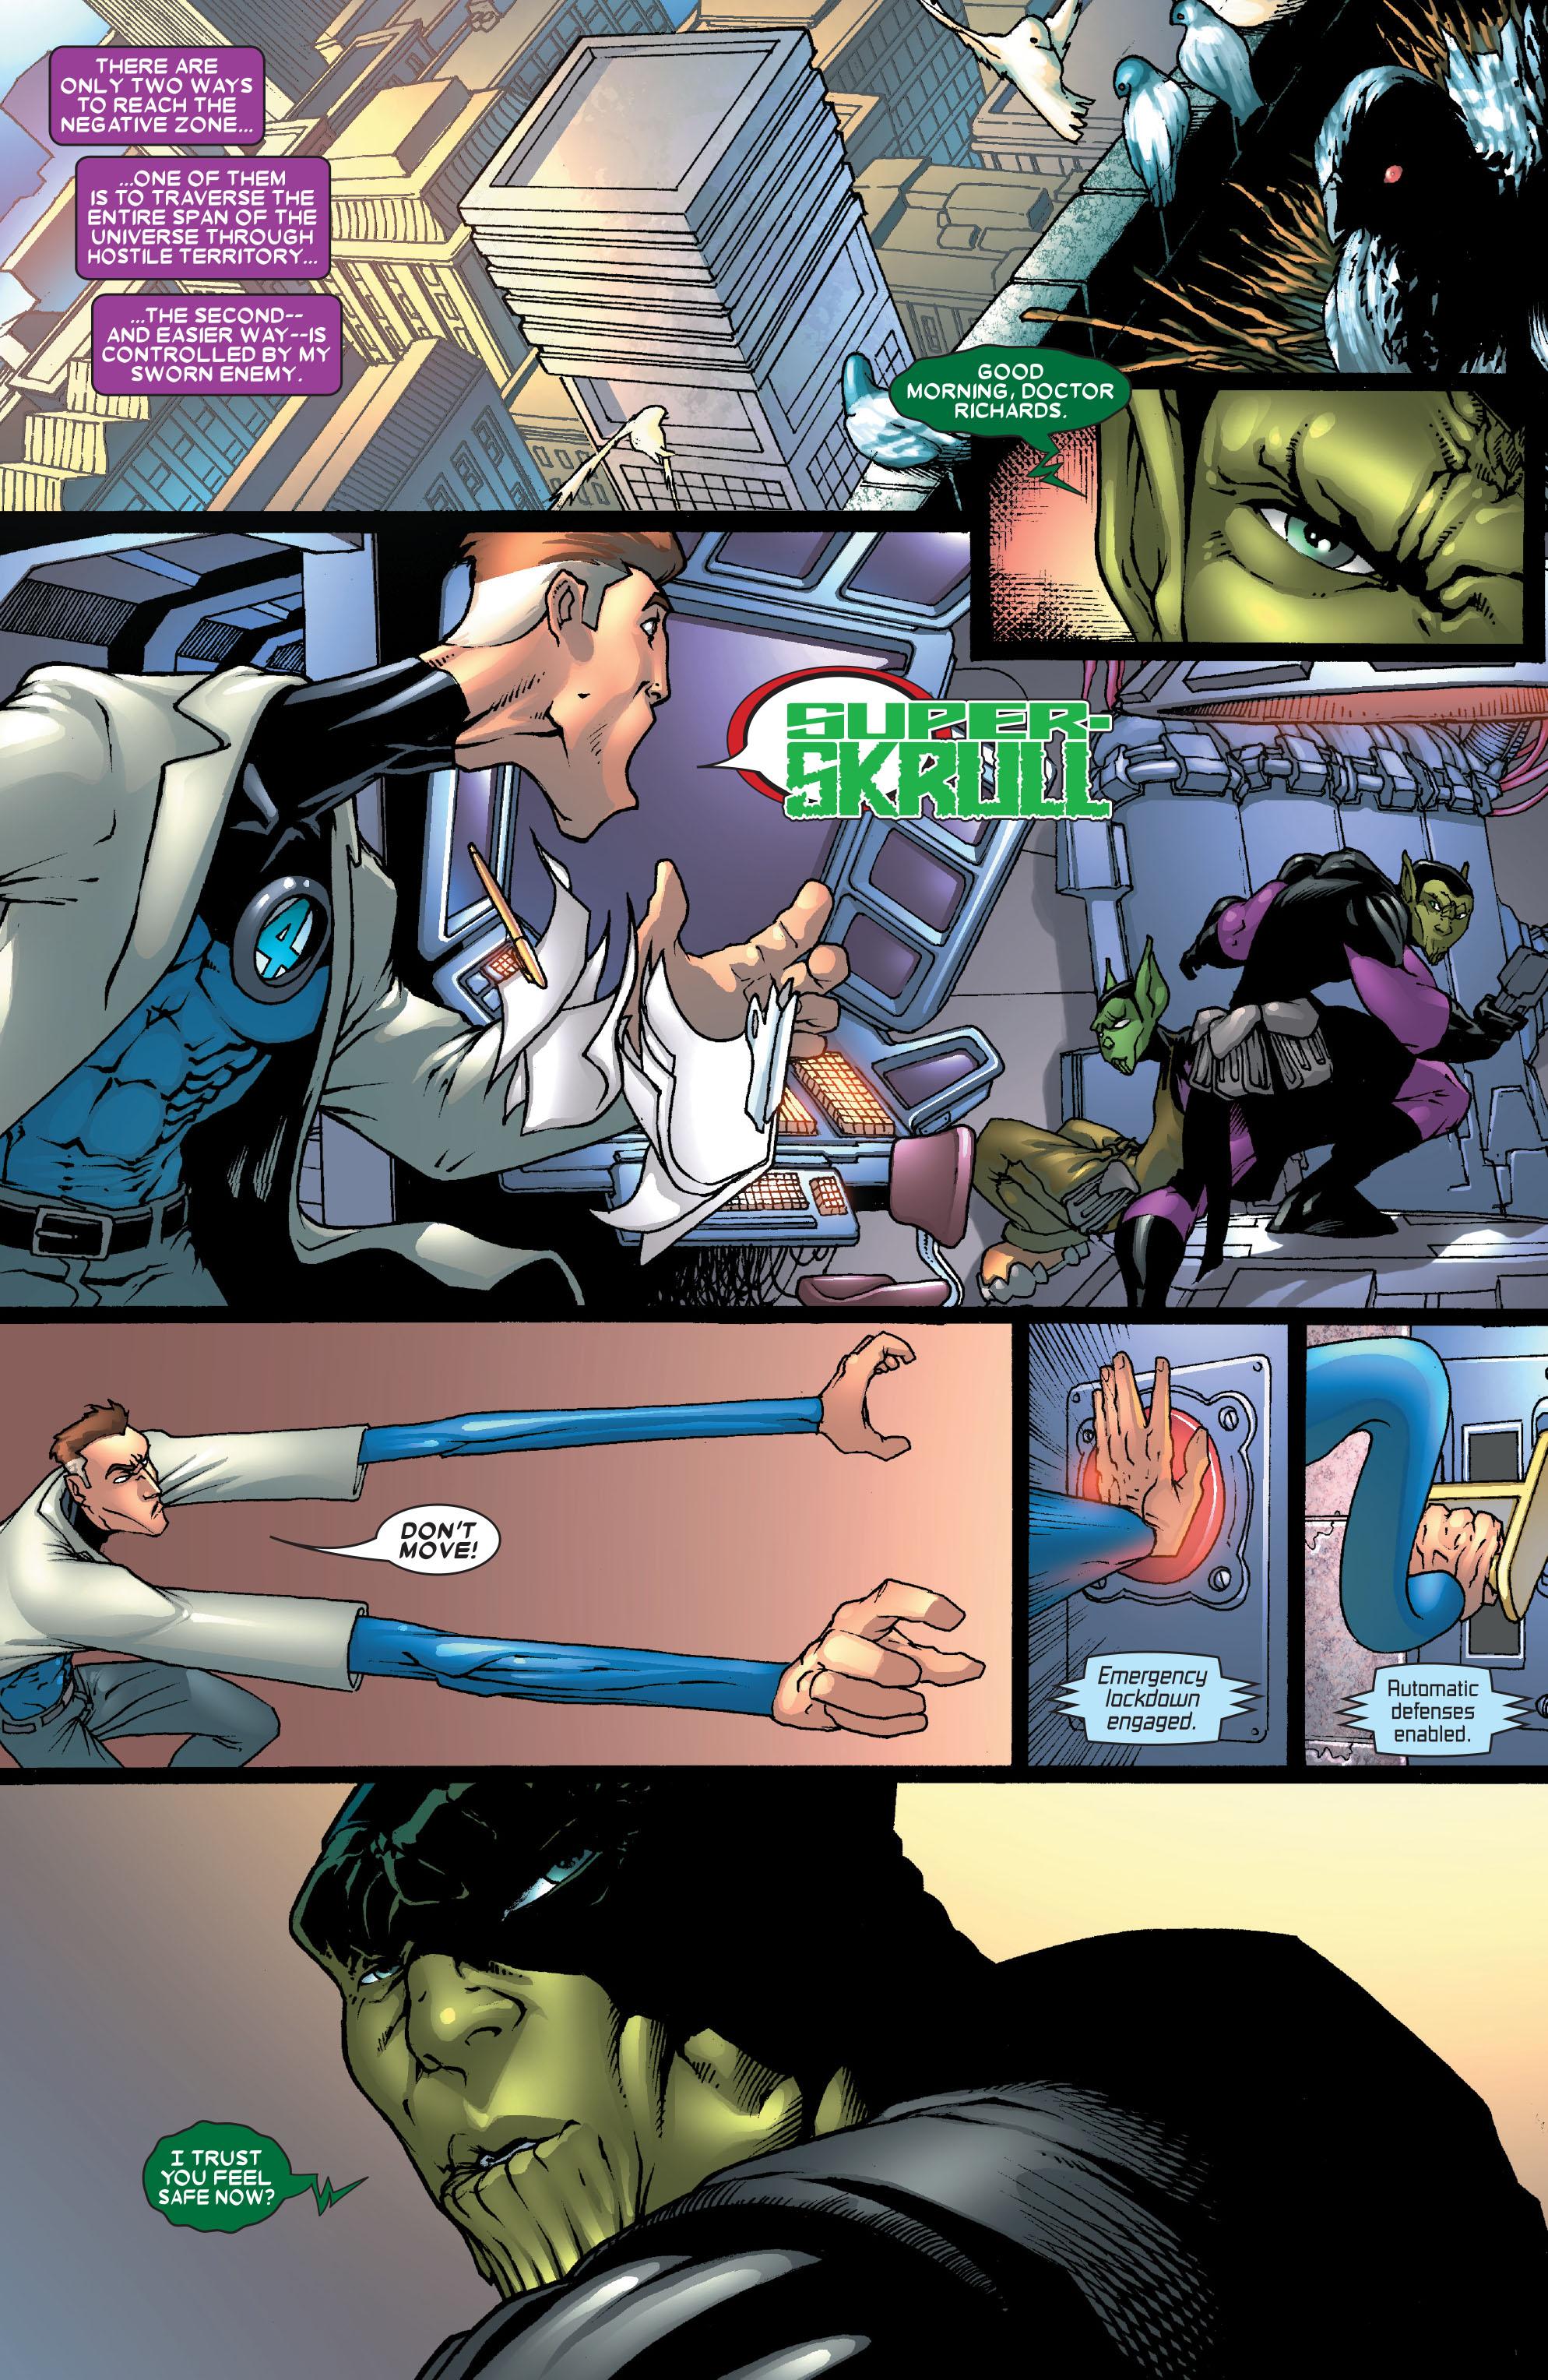 Read online Annihilation: Super-Skrull comic -  Issue #1 - 21